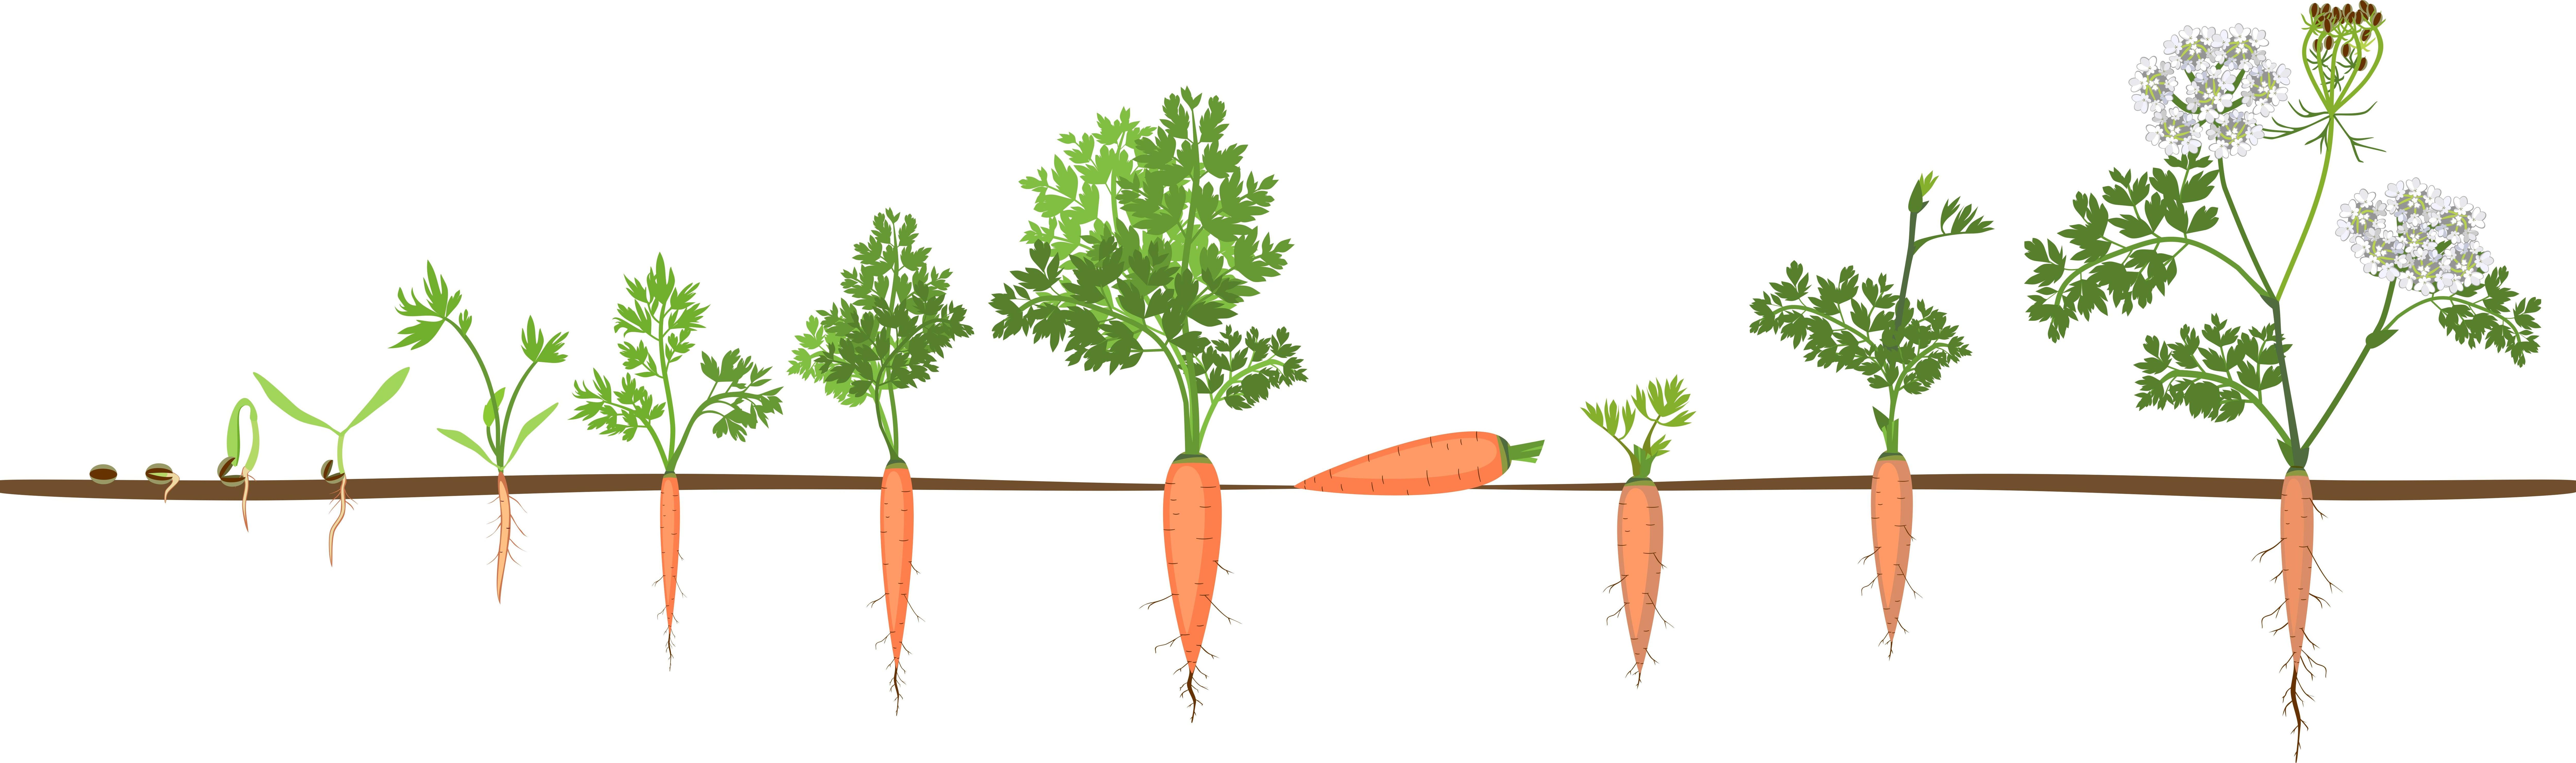 Paprastoji morka (dvimetis augalo ciklas)